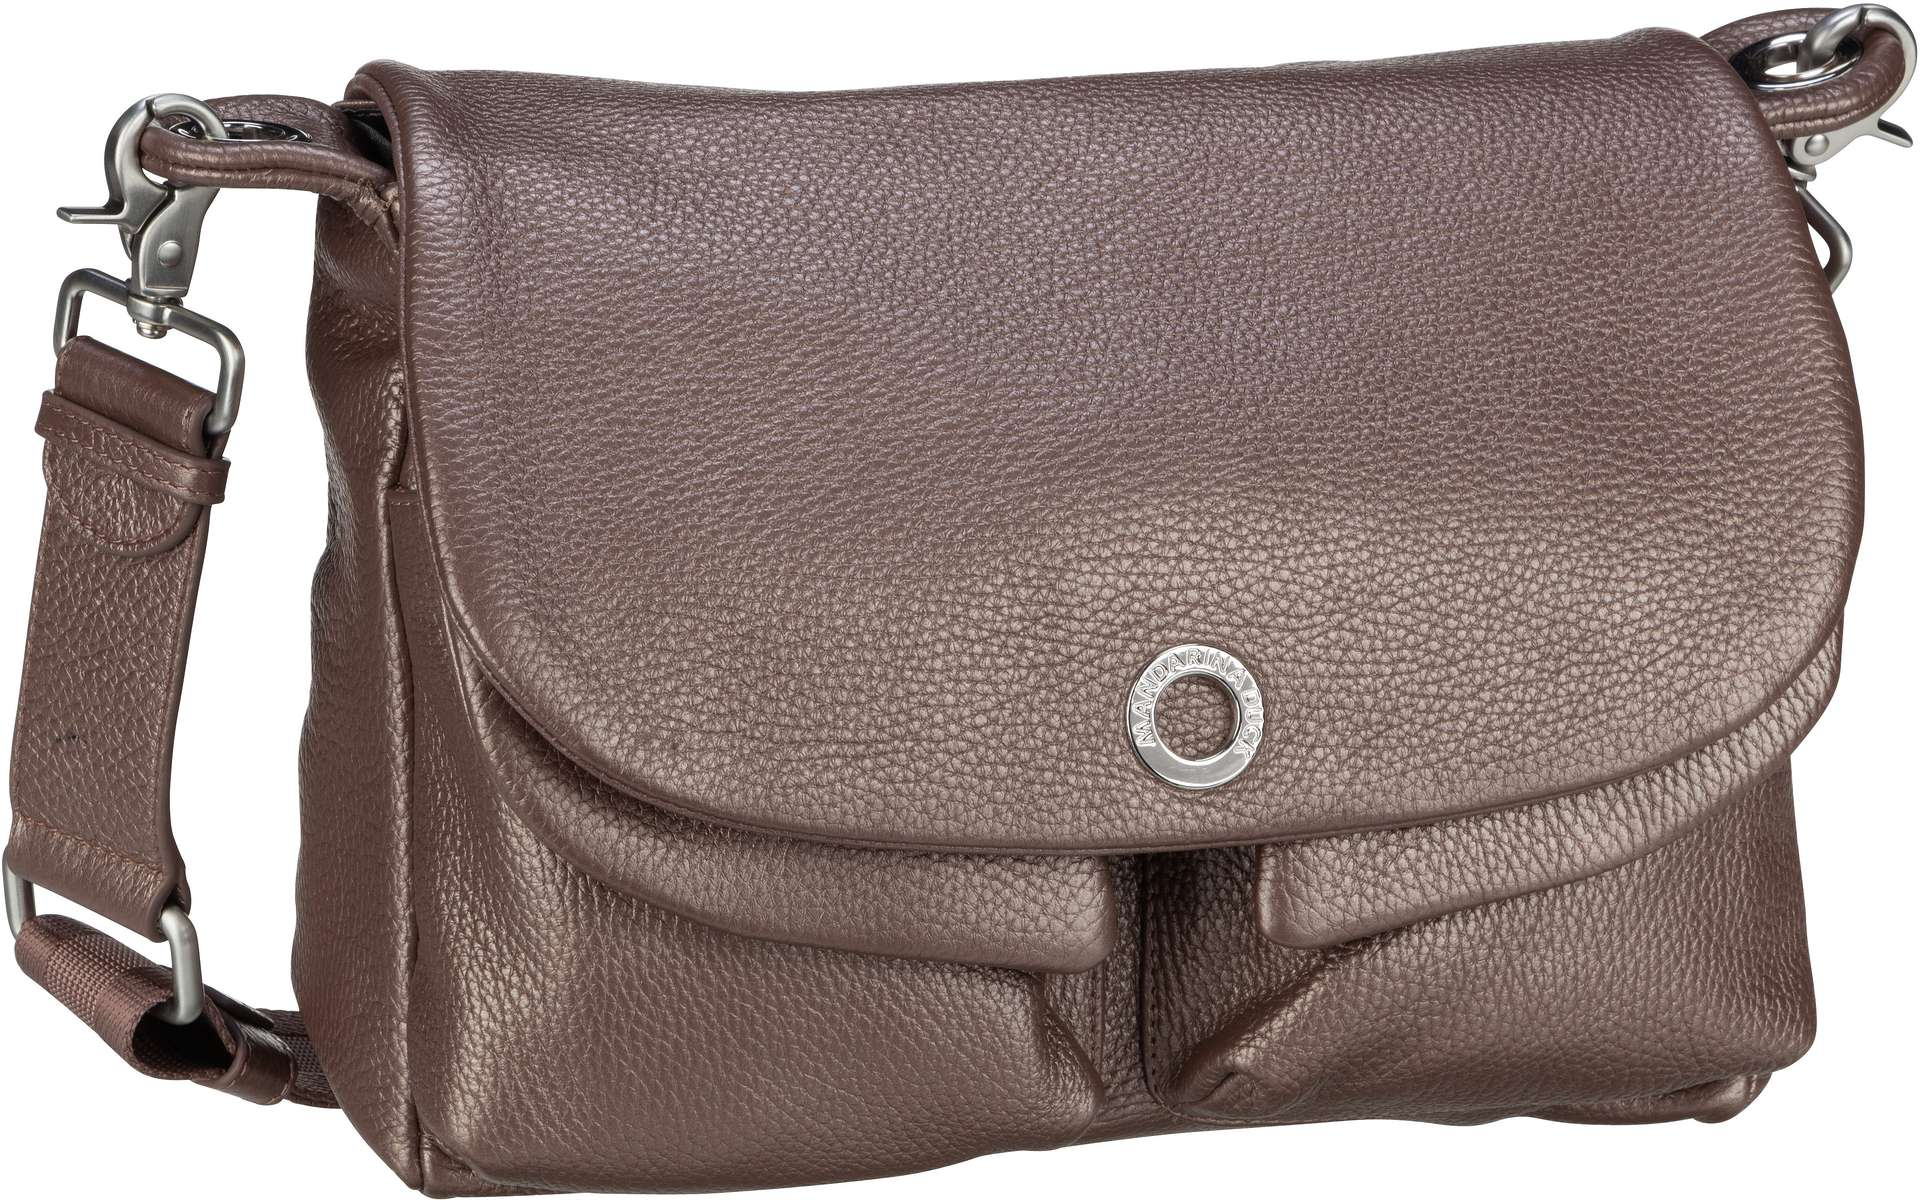 Umhängetasche Mellow Leather Lux Shoulder Bag ZLT23 Smog